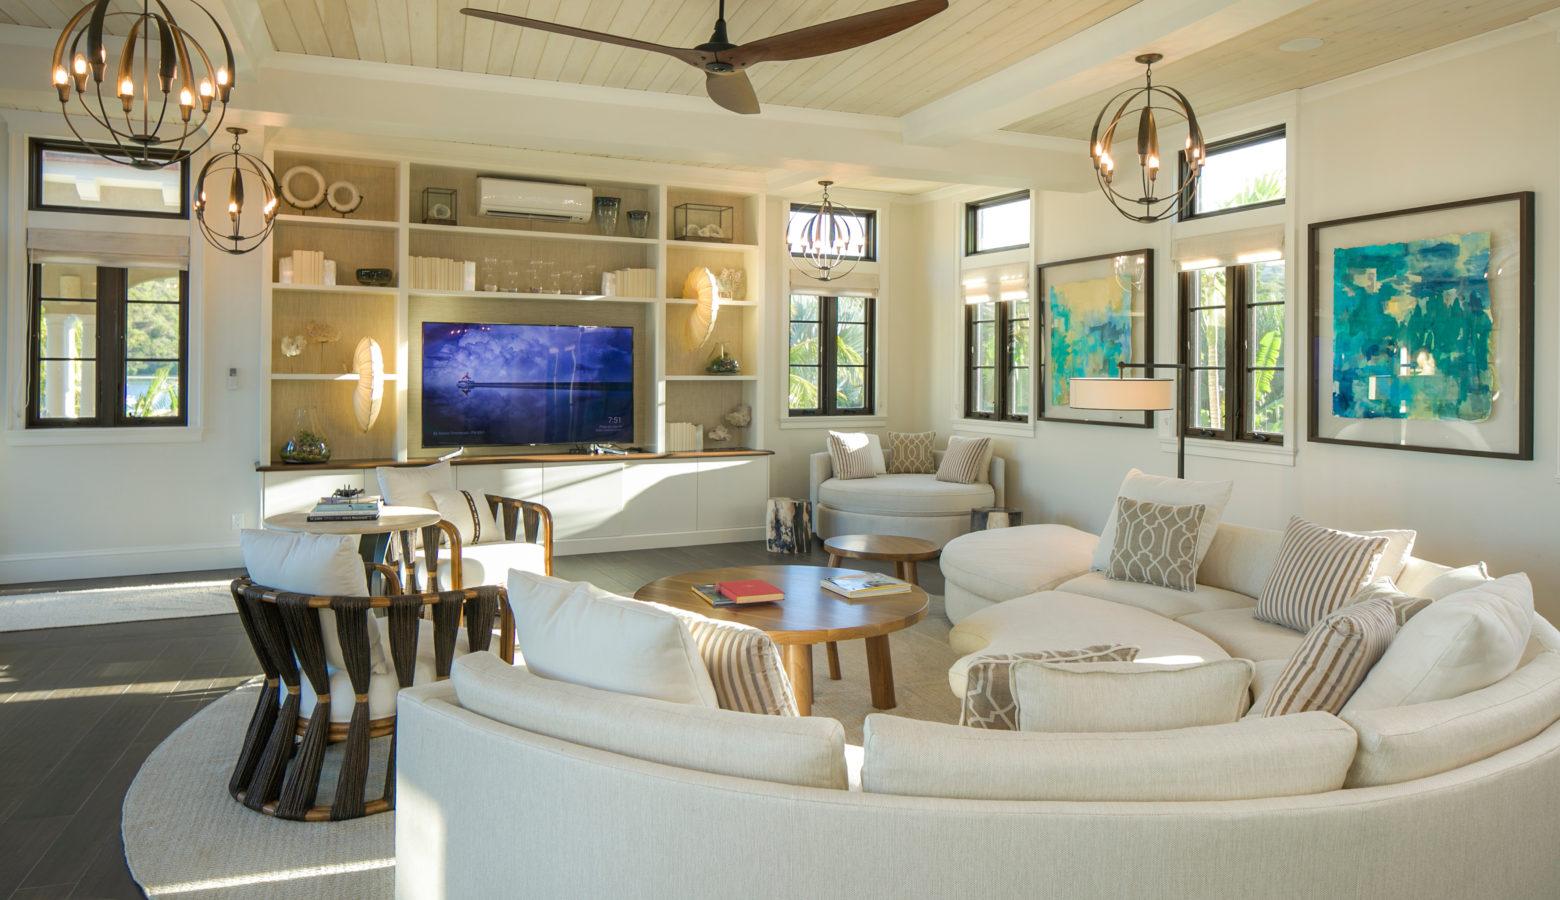 Home Media Rooms Design Ideas Tv Rooms Theater Room